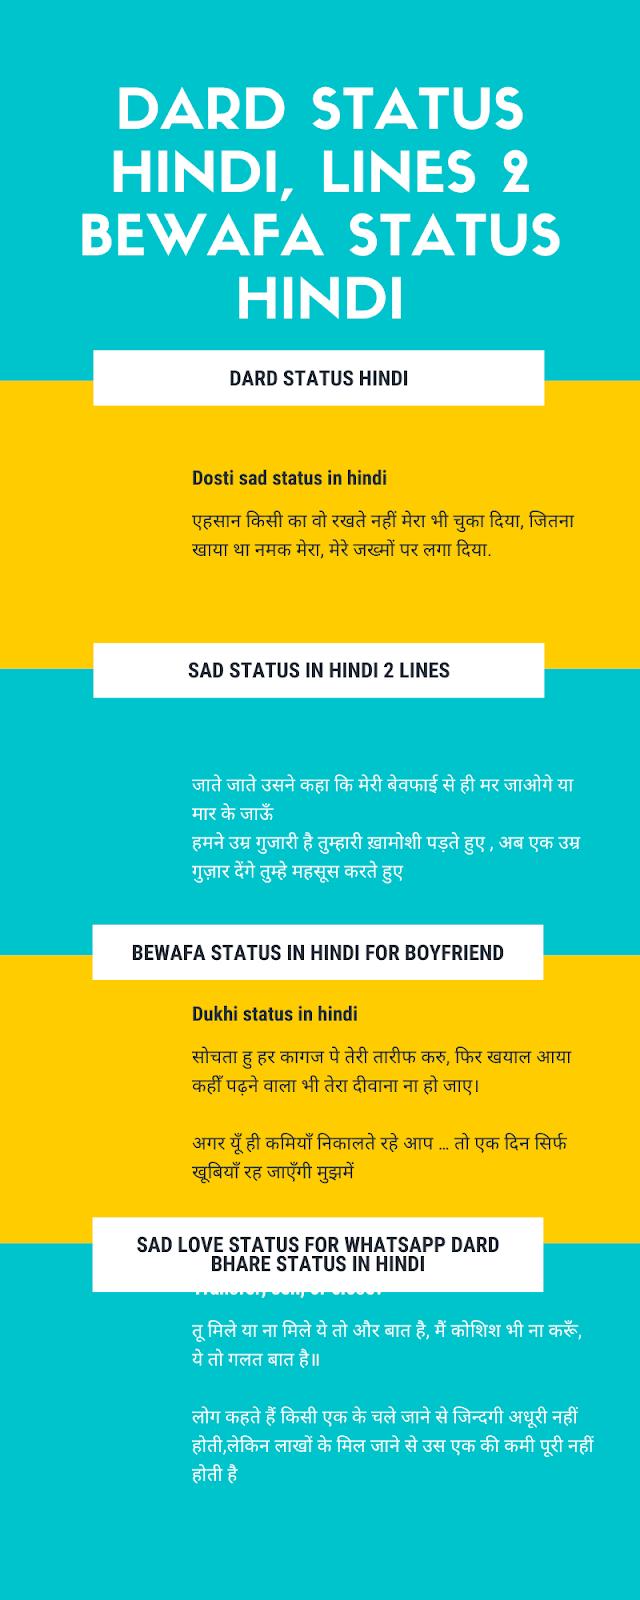 DARD STATUS HINDI, LINES 2 BEWAFA STATUS HINDI, SAD STATUS FOR WHATSAPP